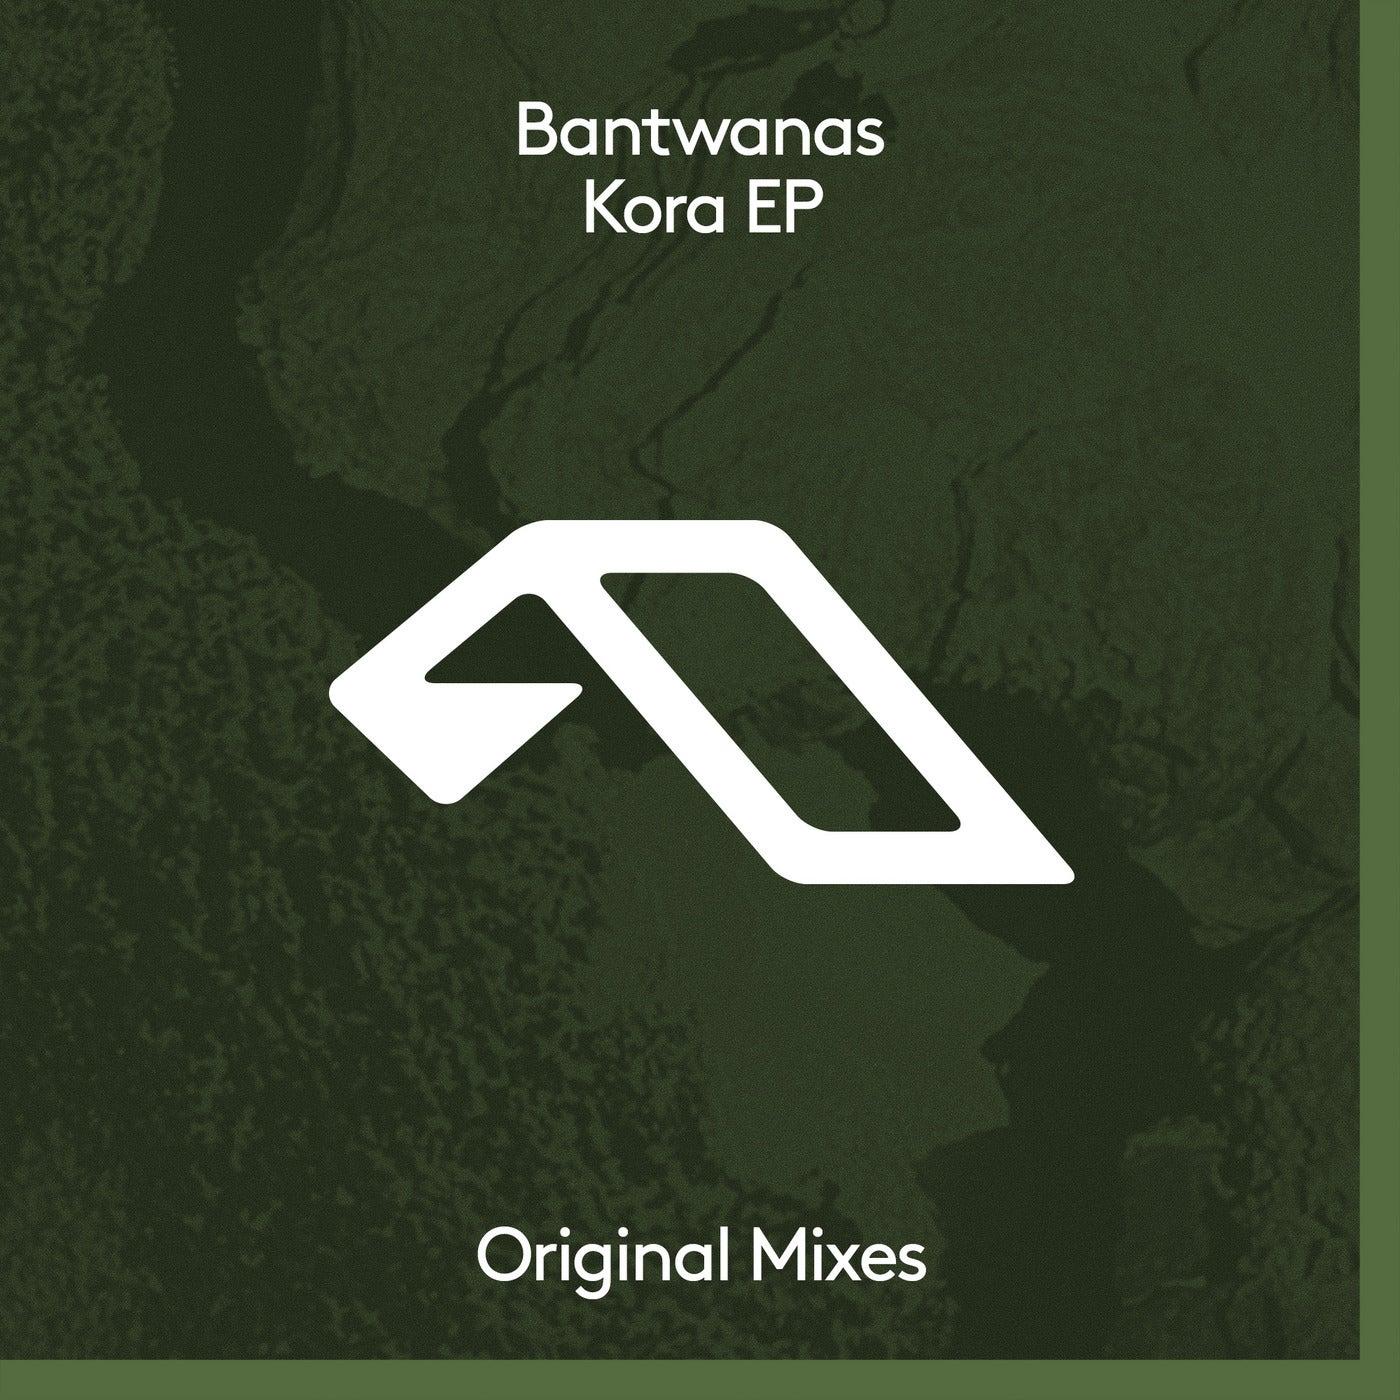 Kora feat. Pops Mohamed feat. Sobantwana (Original Mix)